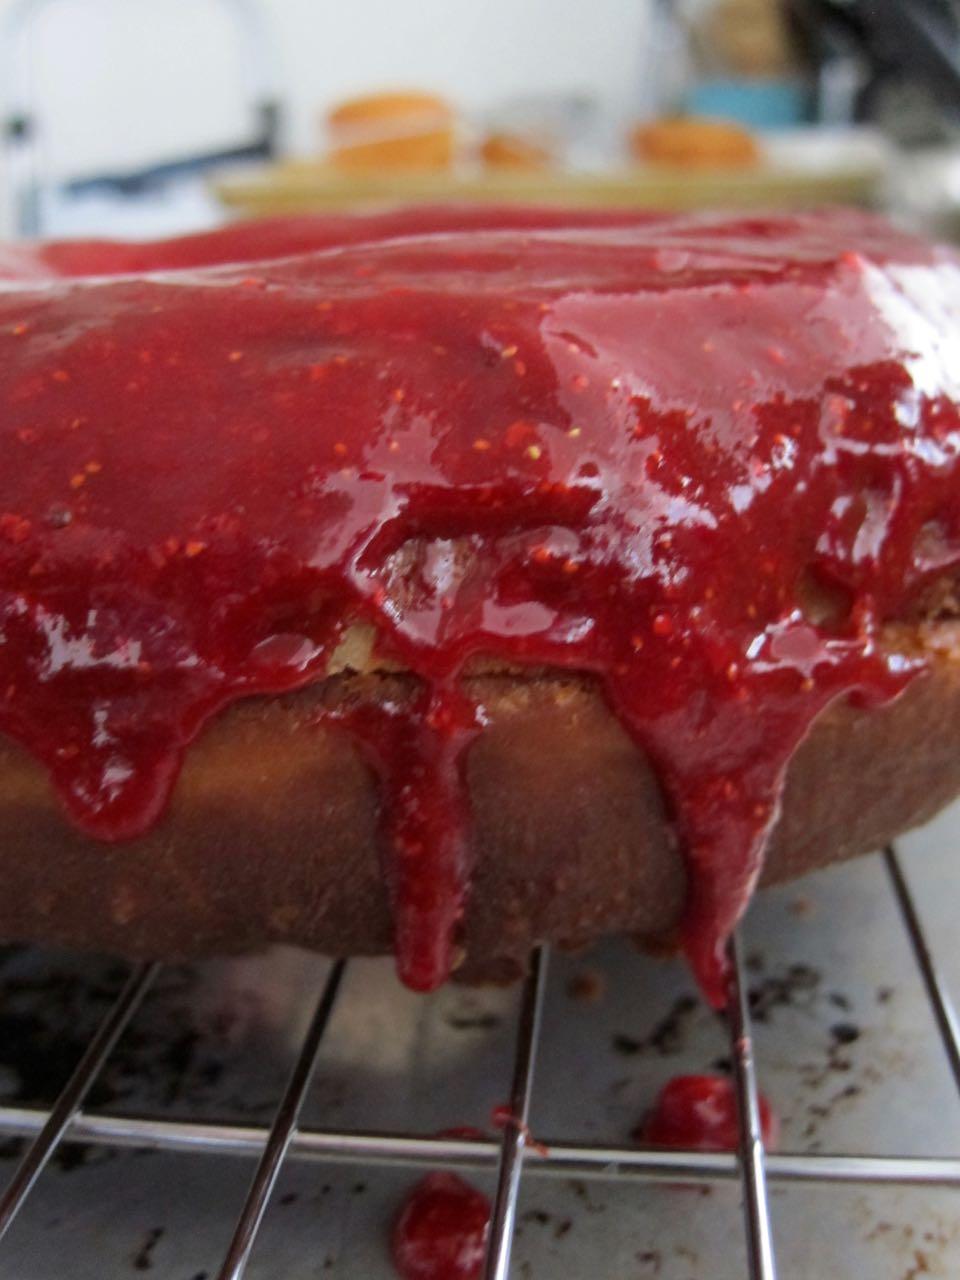 glaze dripping off diant donut